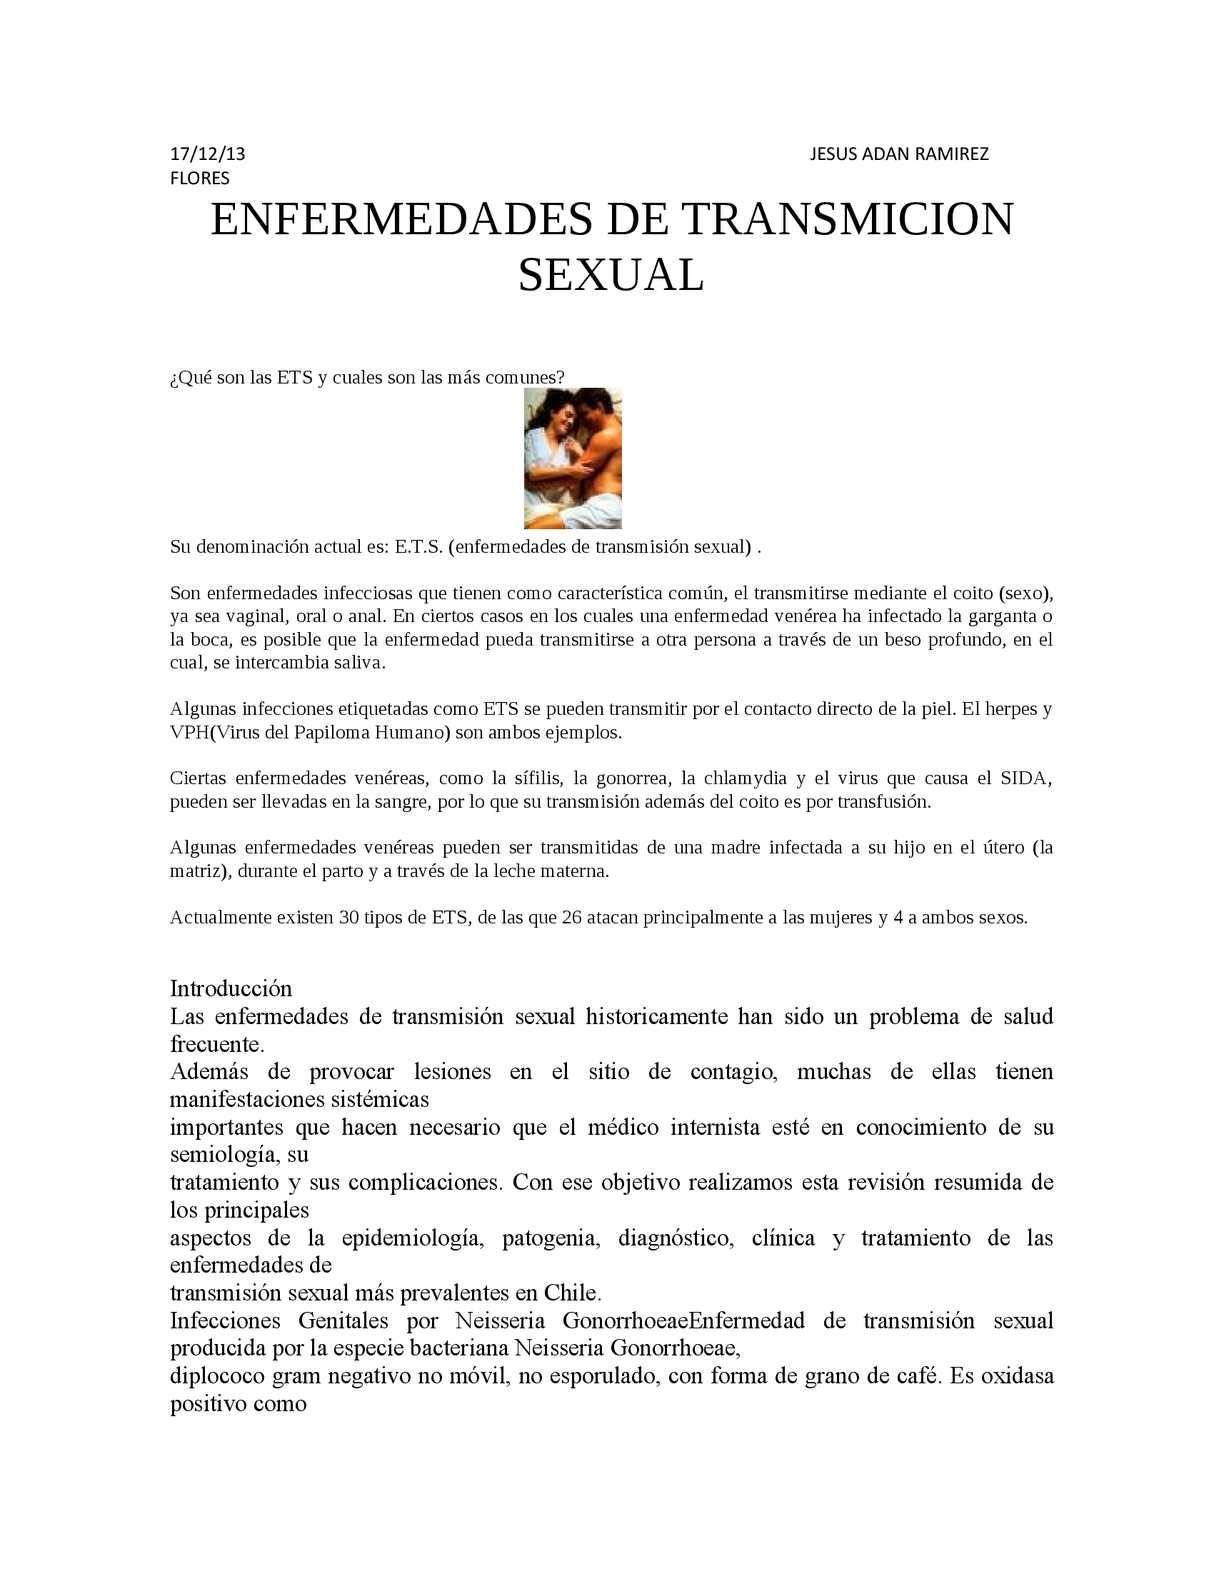 papiloma humano se transmite por transfusion de sangre